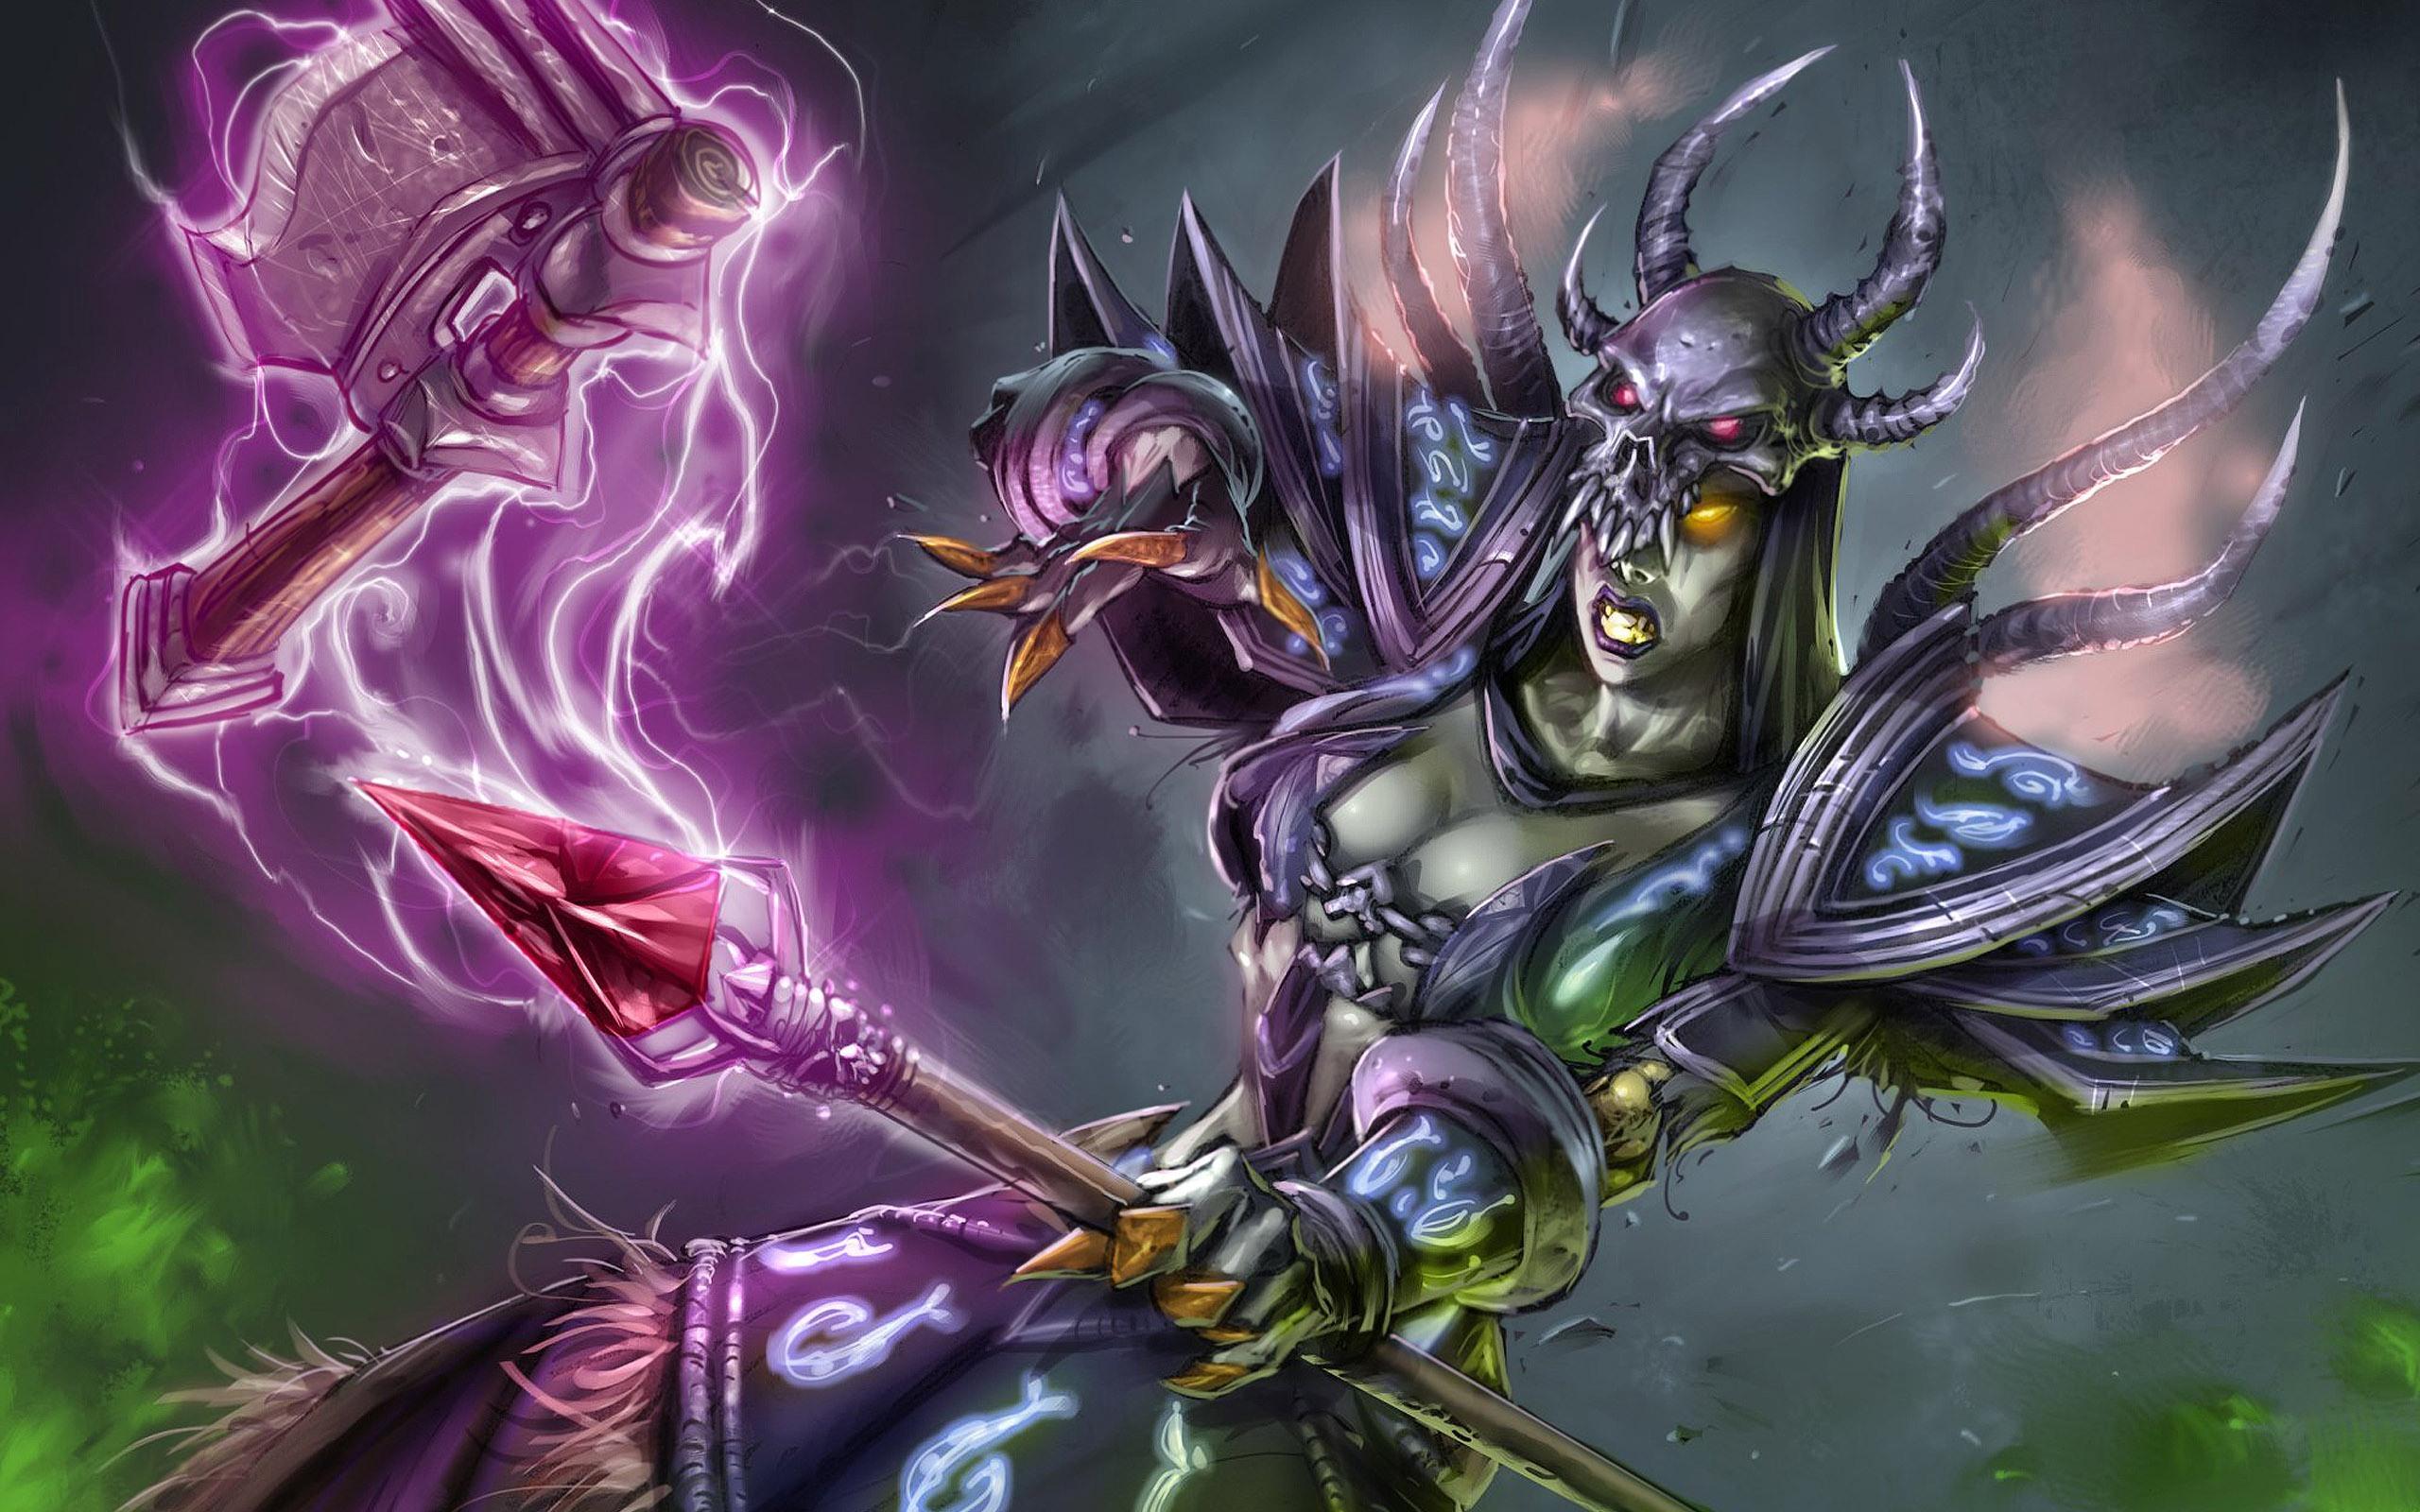 Free Download Wow Orc Warlock Wallpaper World Of Warcraft Warlock